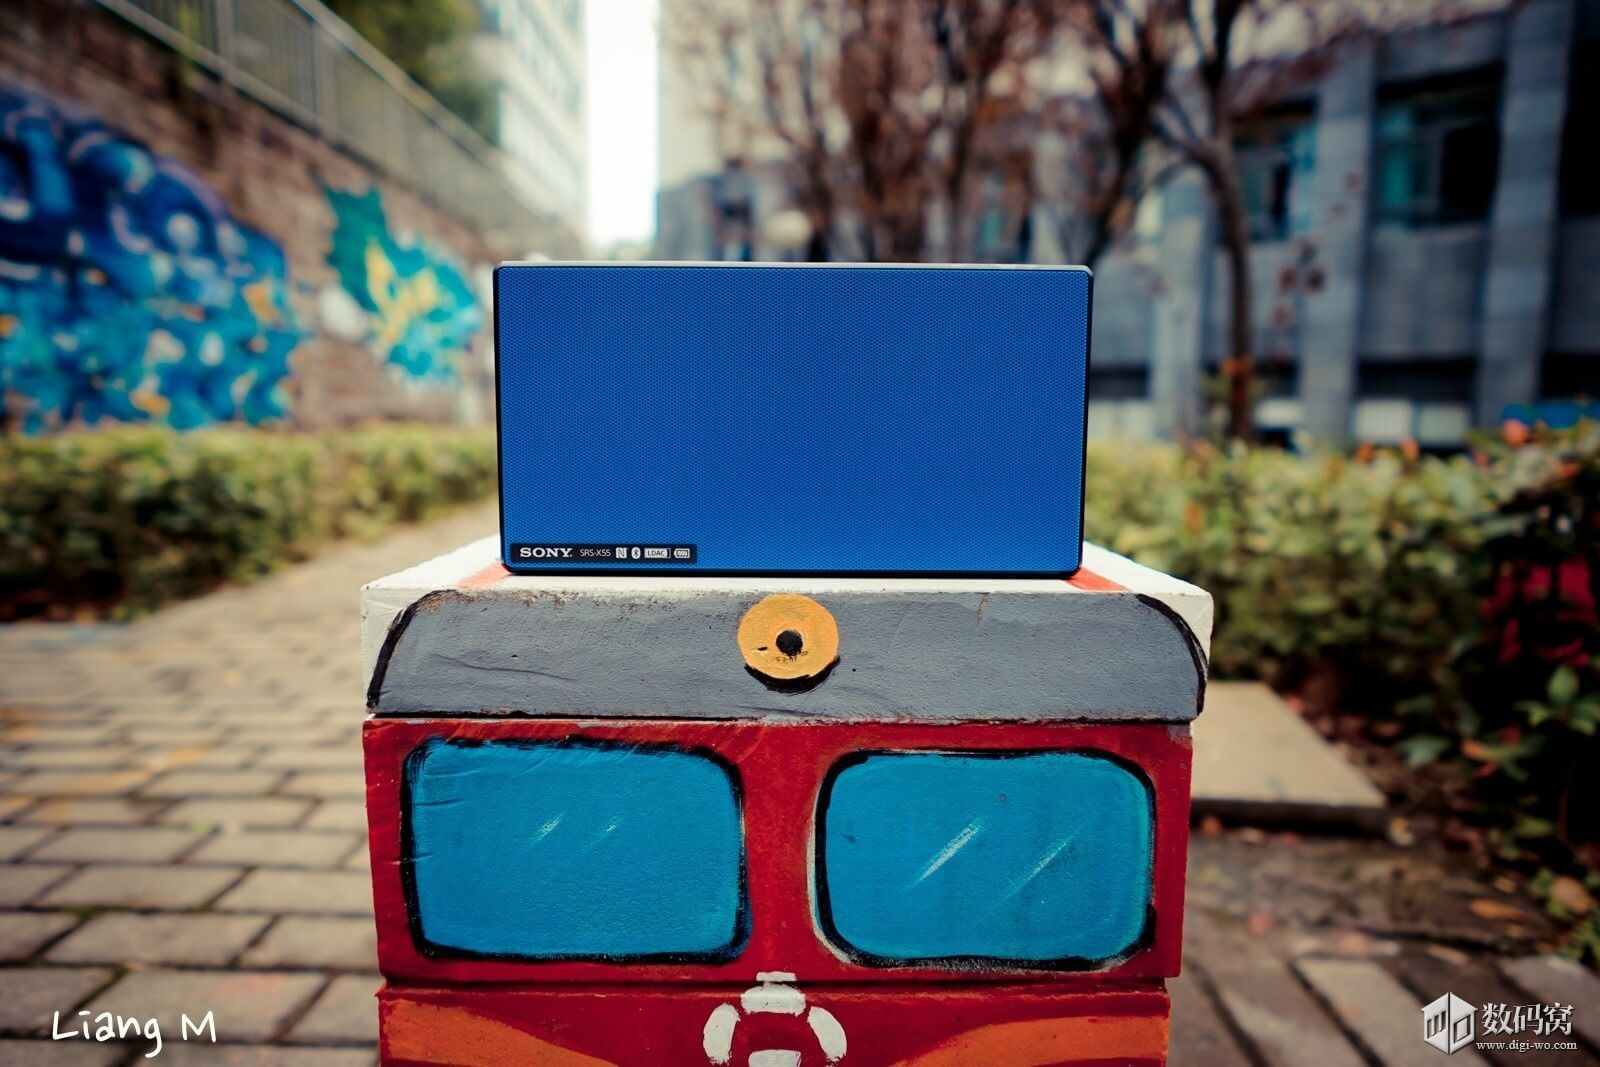 Sony SRS-X55 Bluetooth Speaker hands on pics